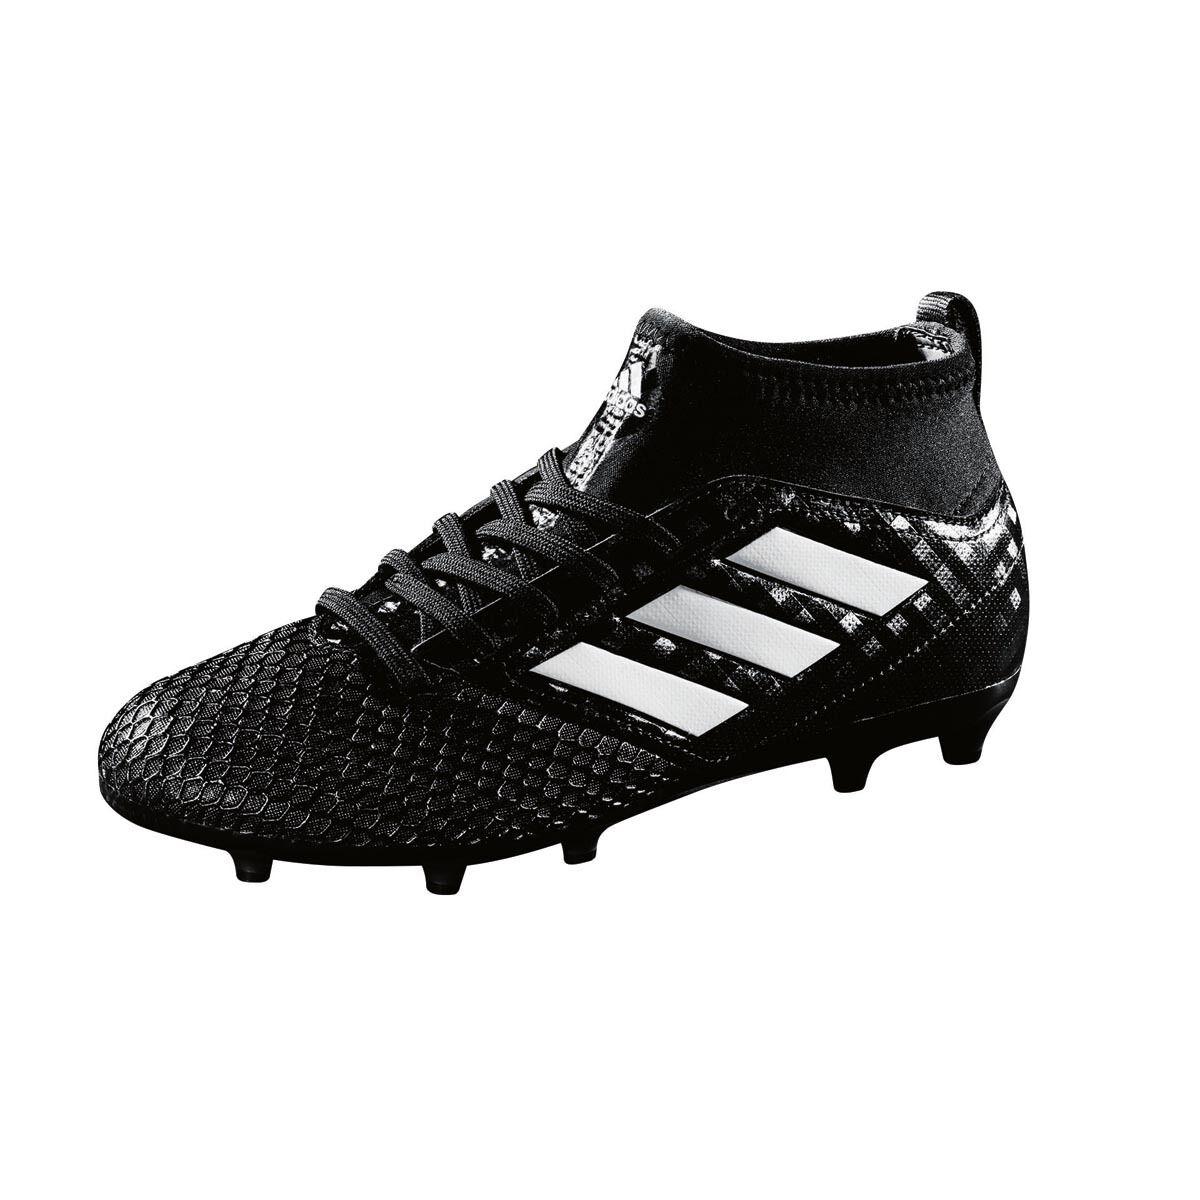 bc02de78ee7 ... ireland adidas ace 17.3 primemesh junior football boots black white us  12 junior black 17002 d516d ...